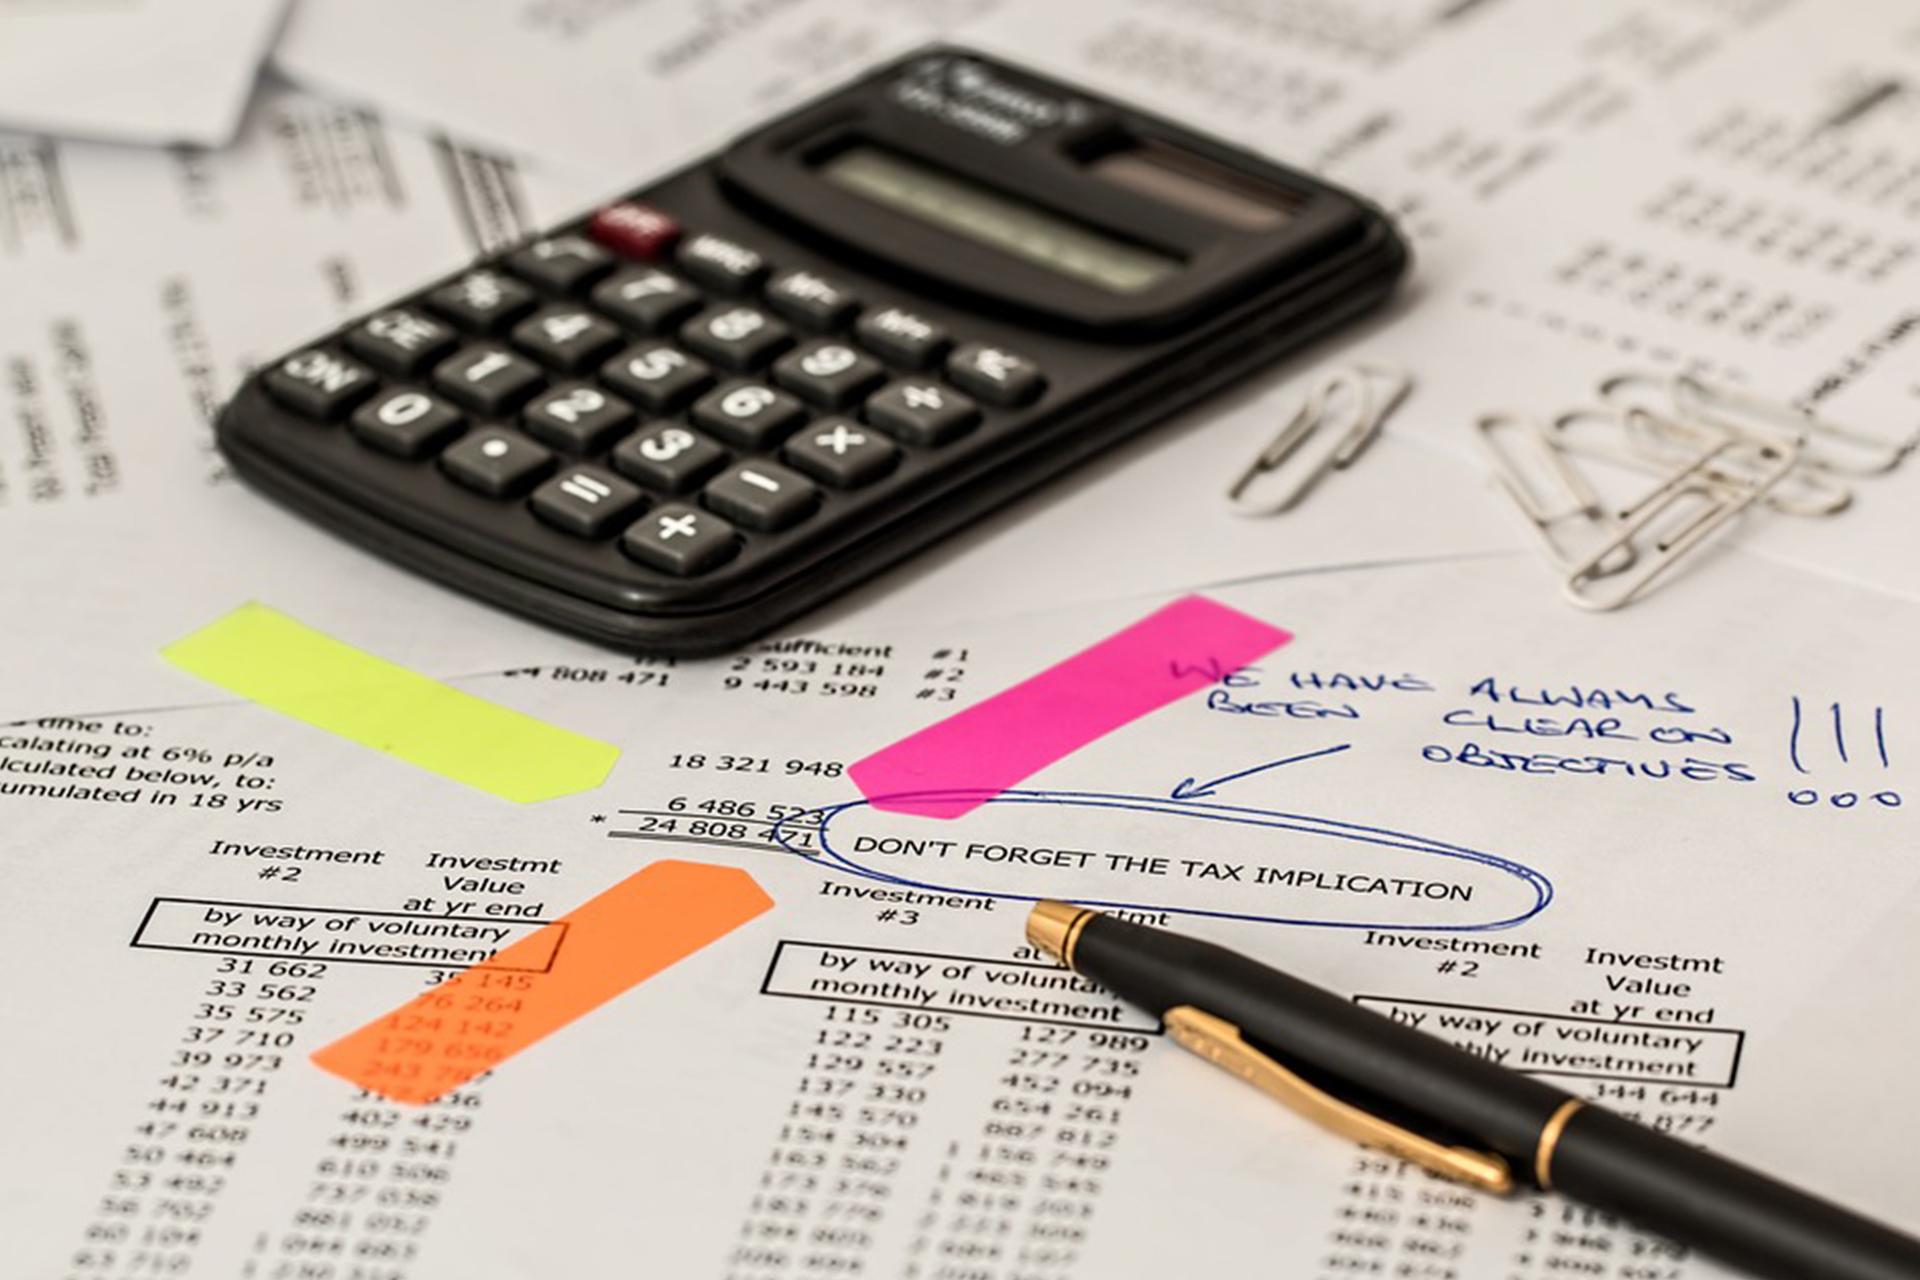 bulletin-de-paie-simplifie-2018-changements